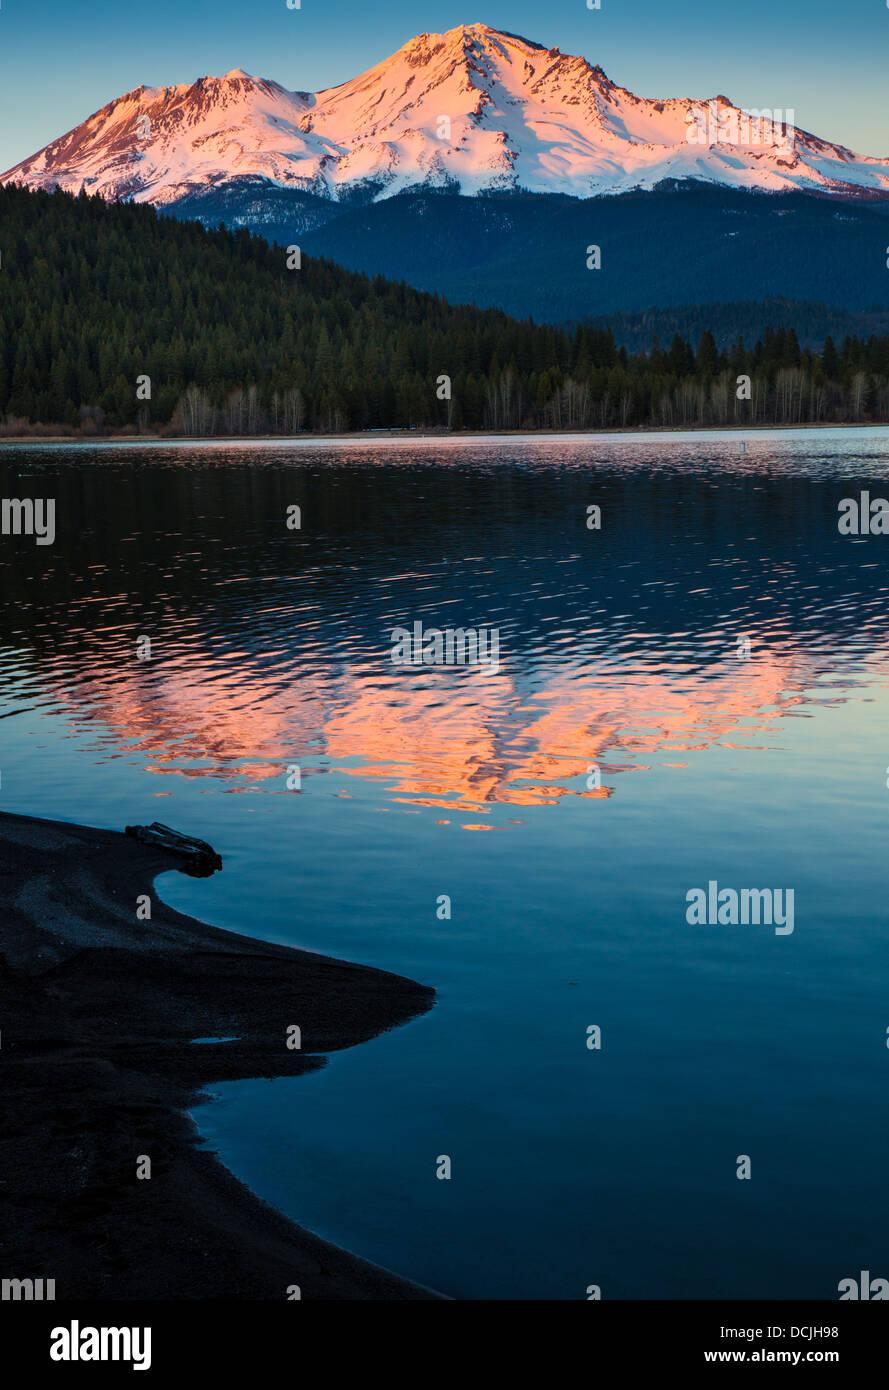 Monte Shasta reflejando en el cercano lago Siskiyou, California Imagen De Stock